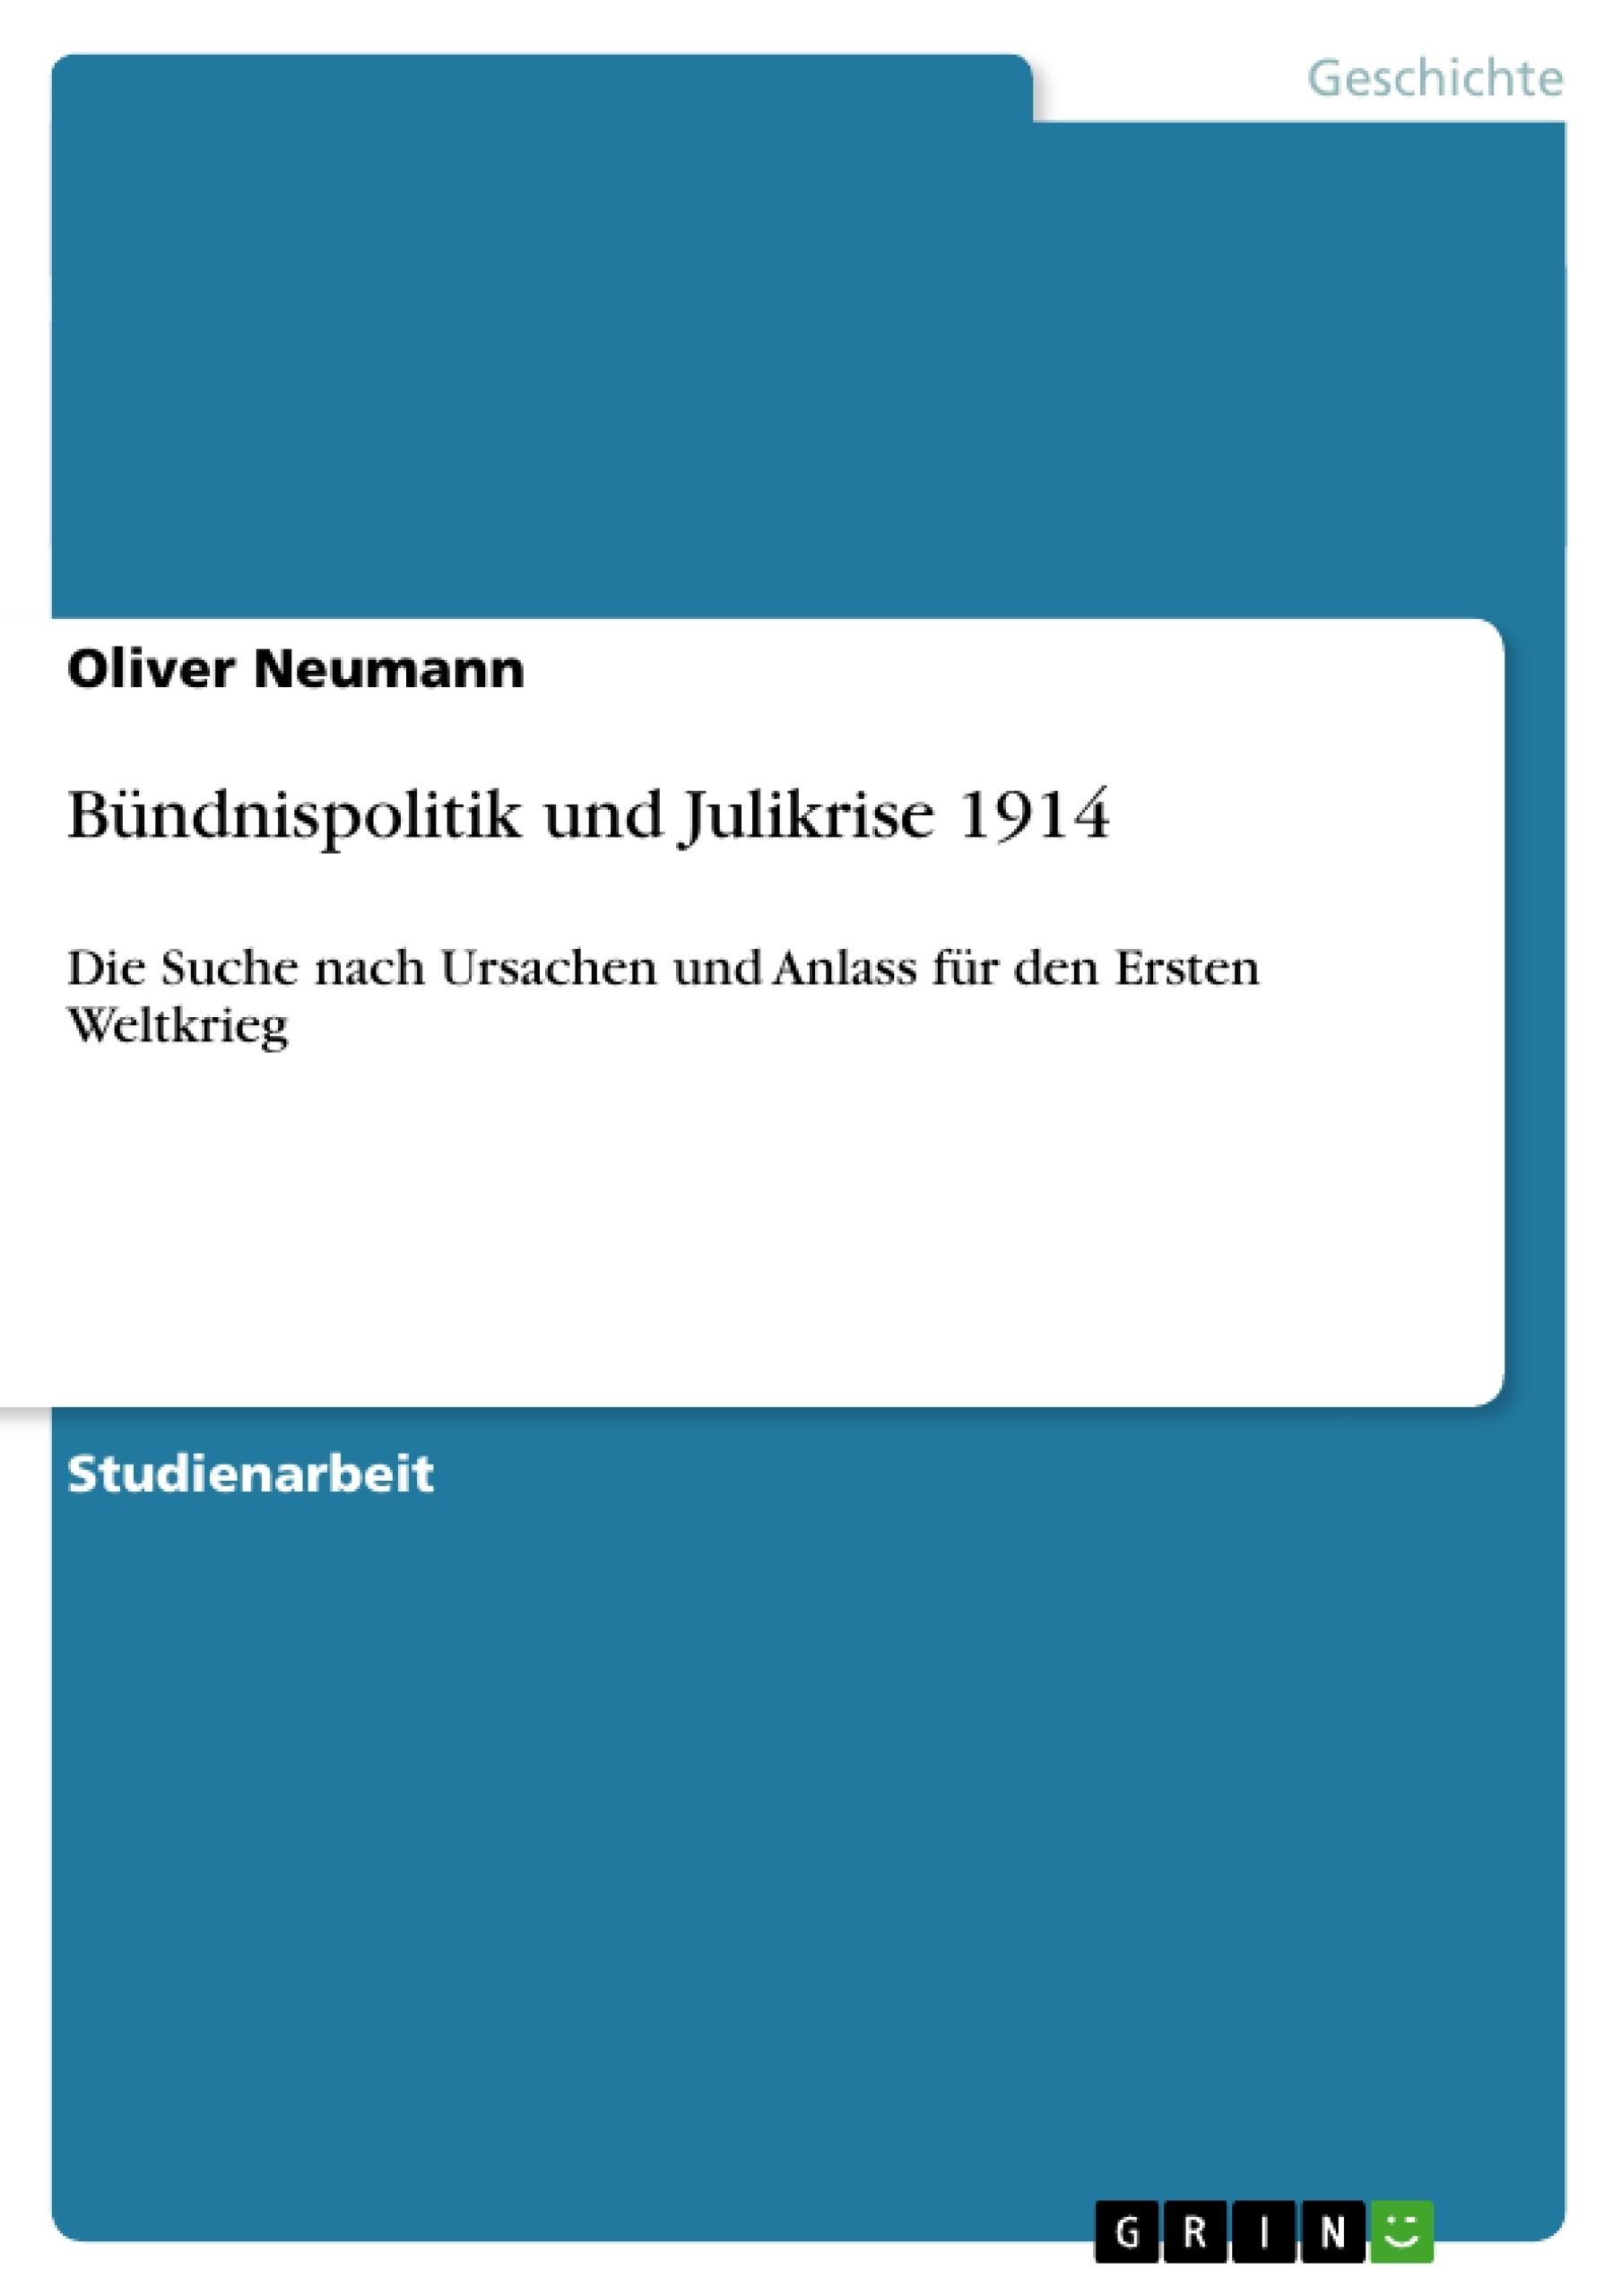 Titel: Bündnispolitik und Julikrise 1914